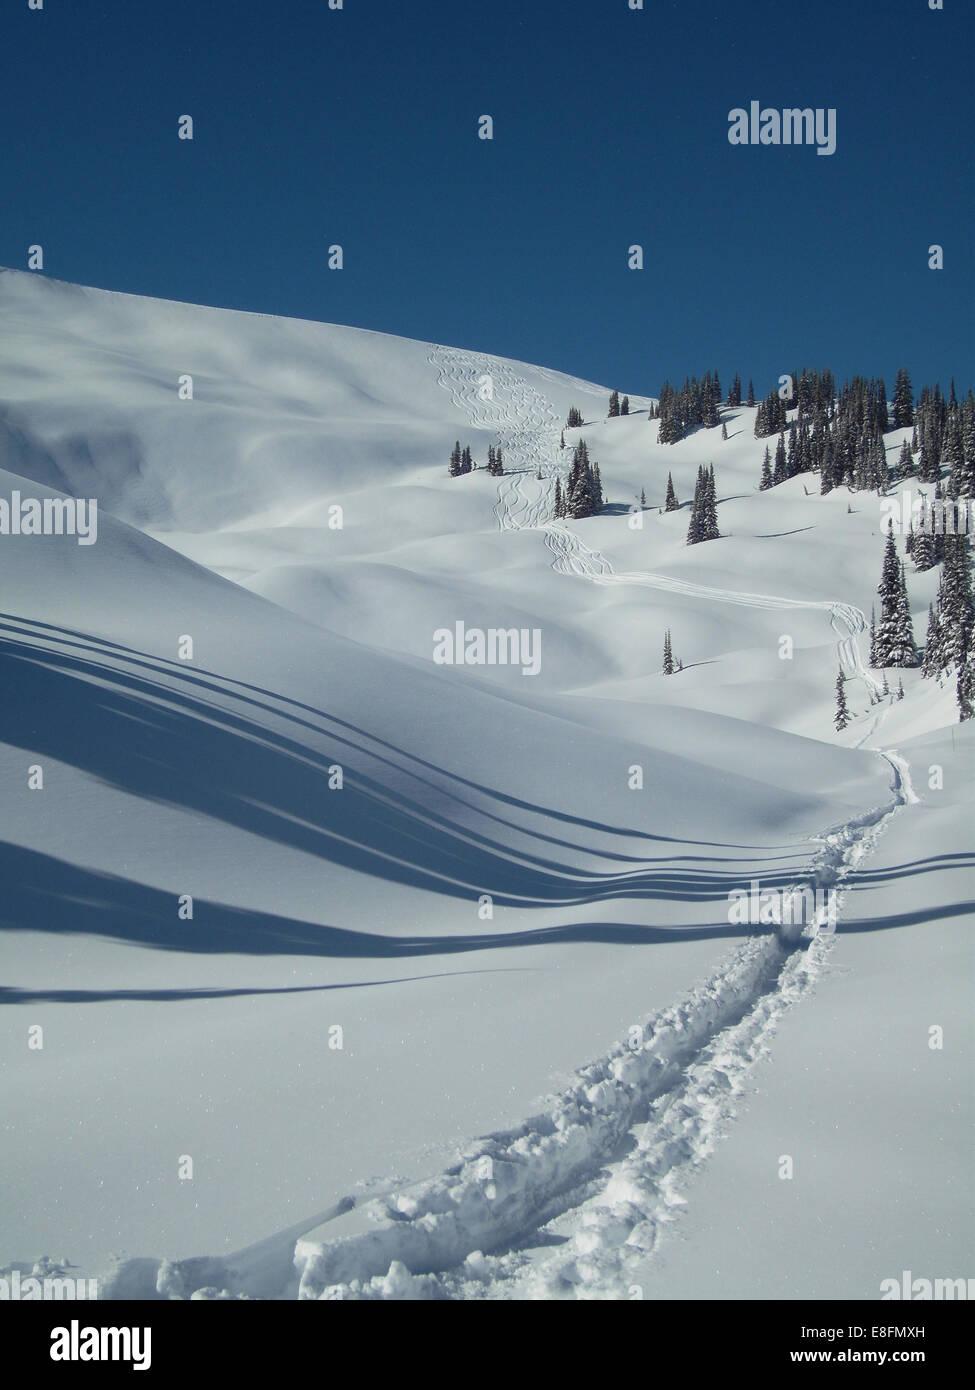 Fresh tracks in snow - Stock Image